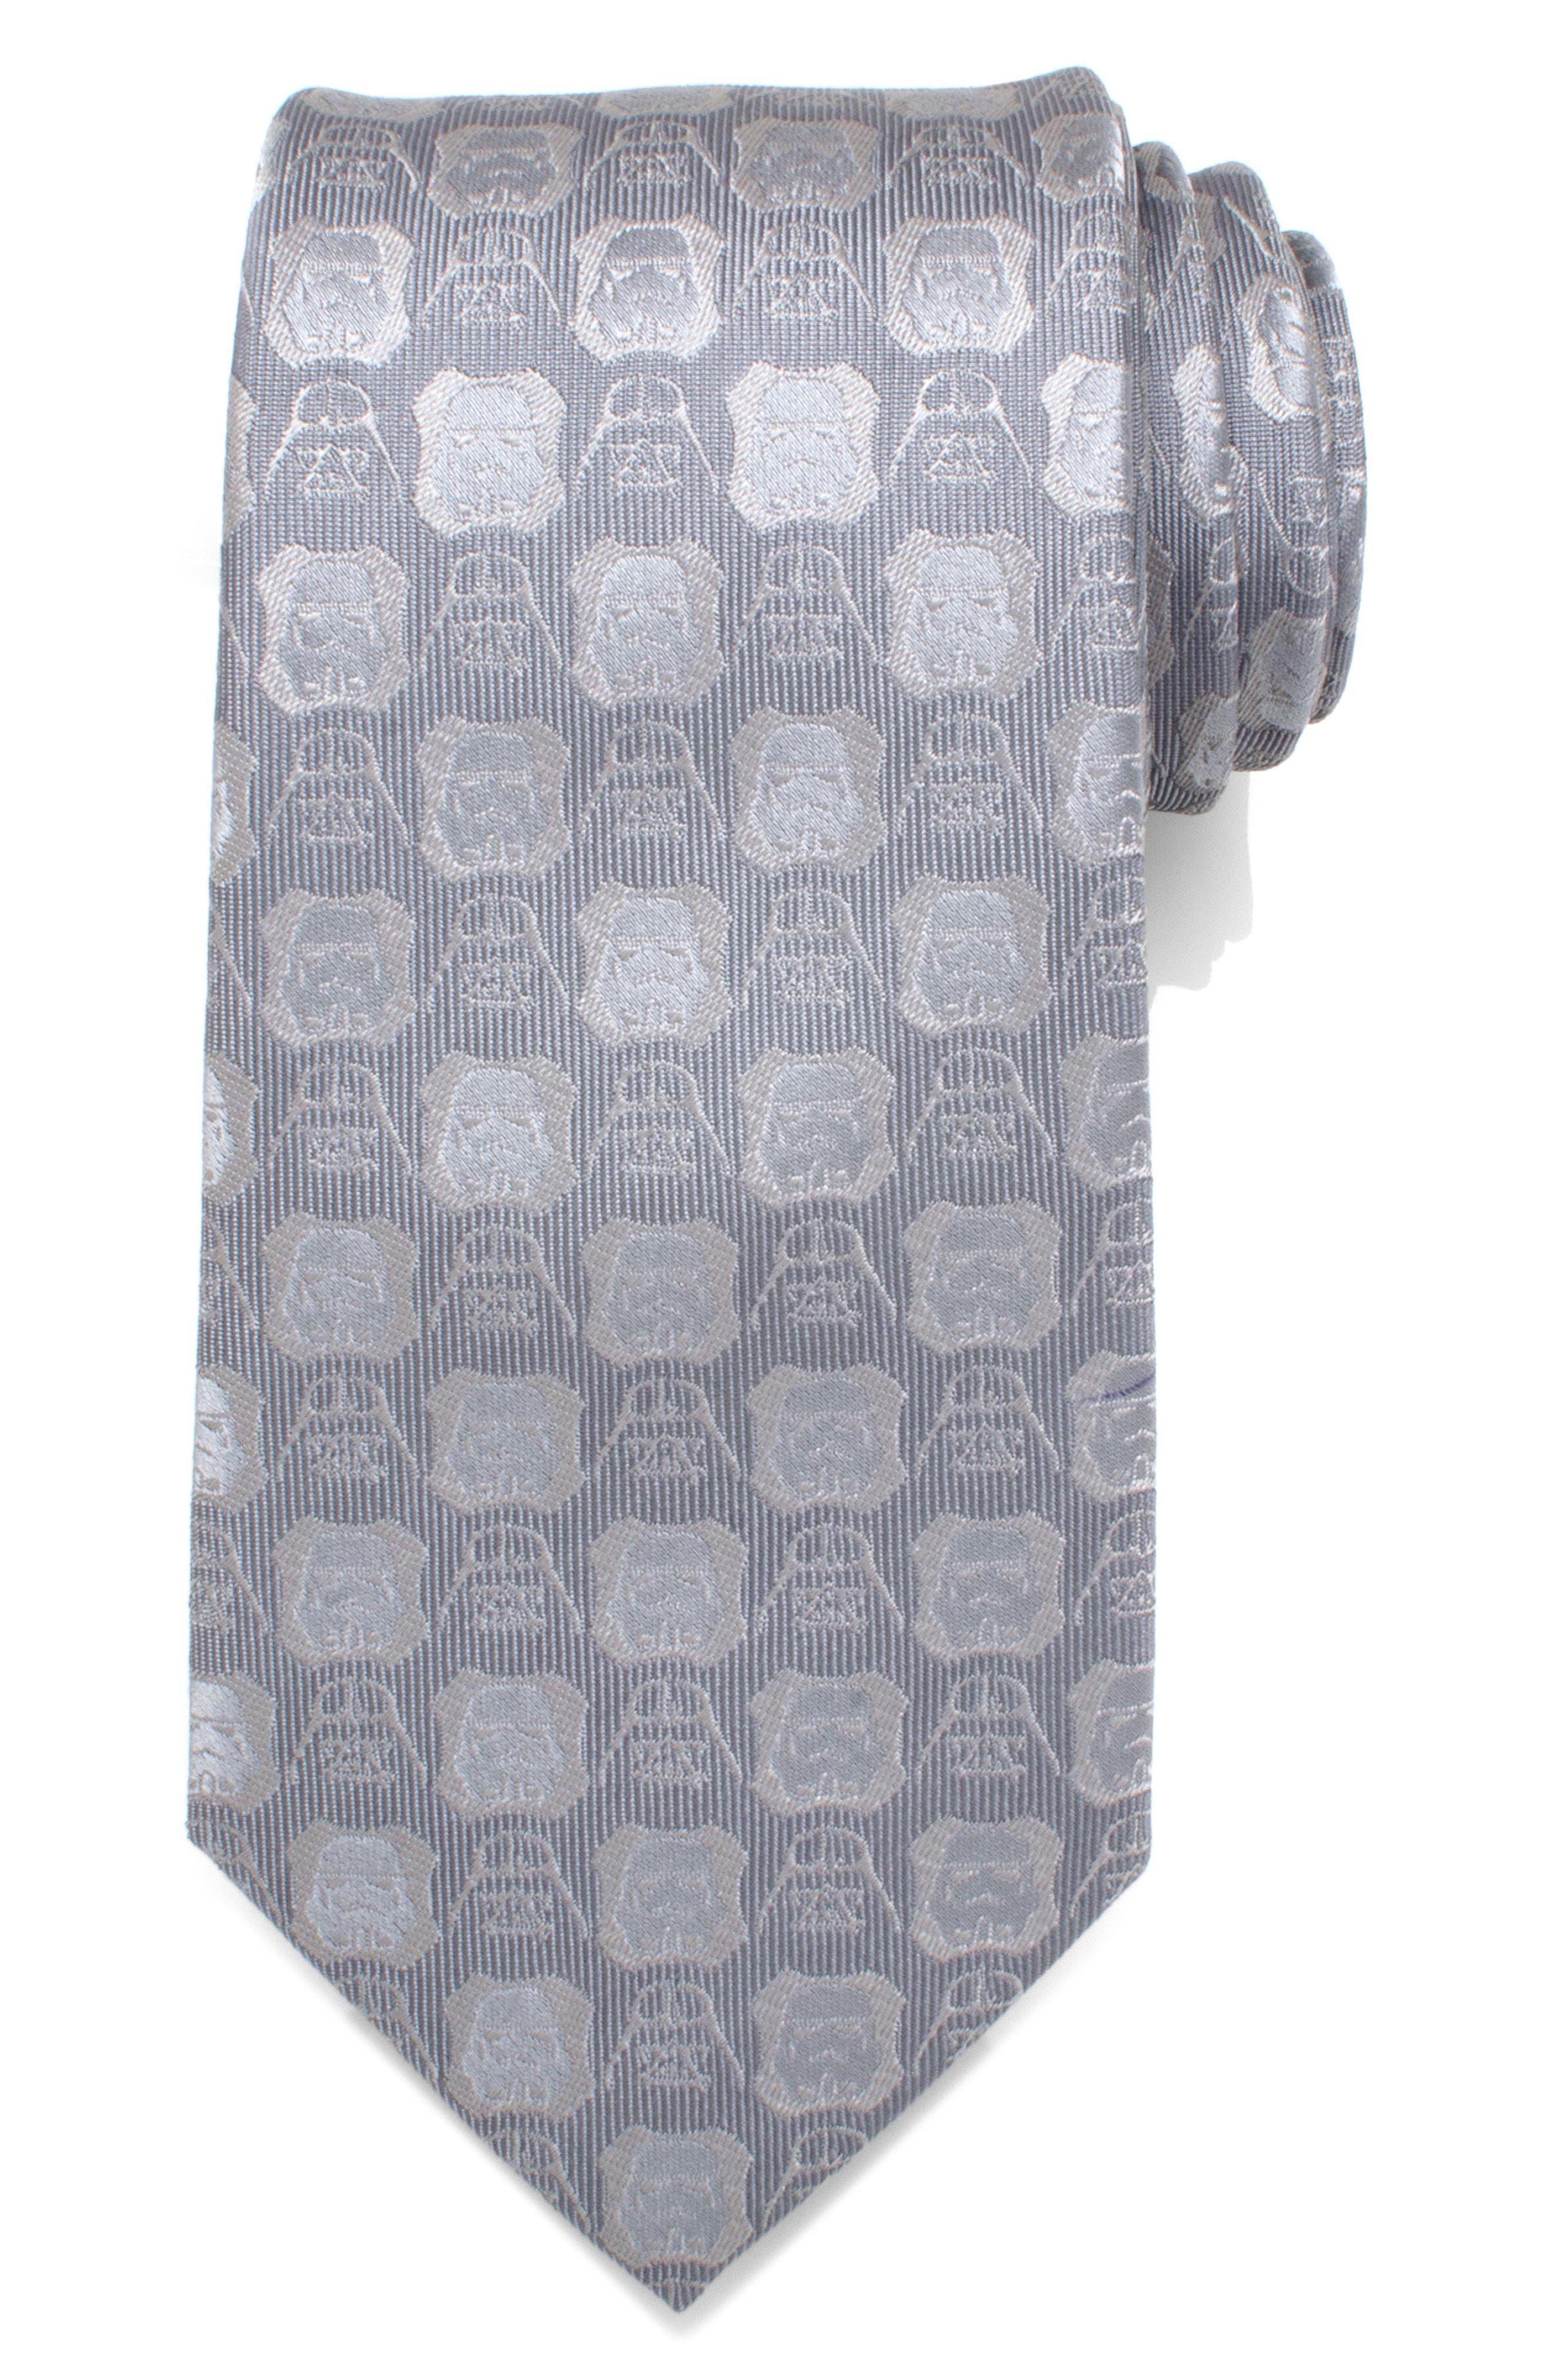 Cufflinks, Inc. Star Wars™ Darth Vader Medallion Silk Tie